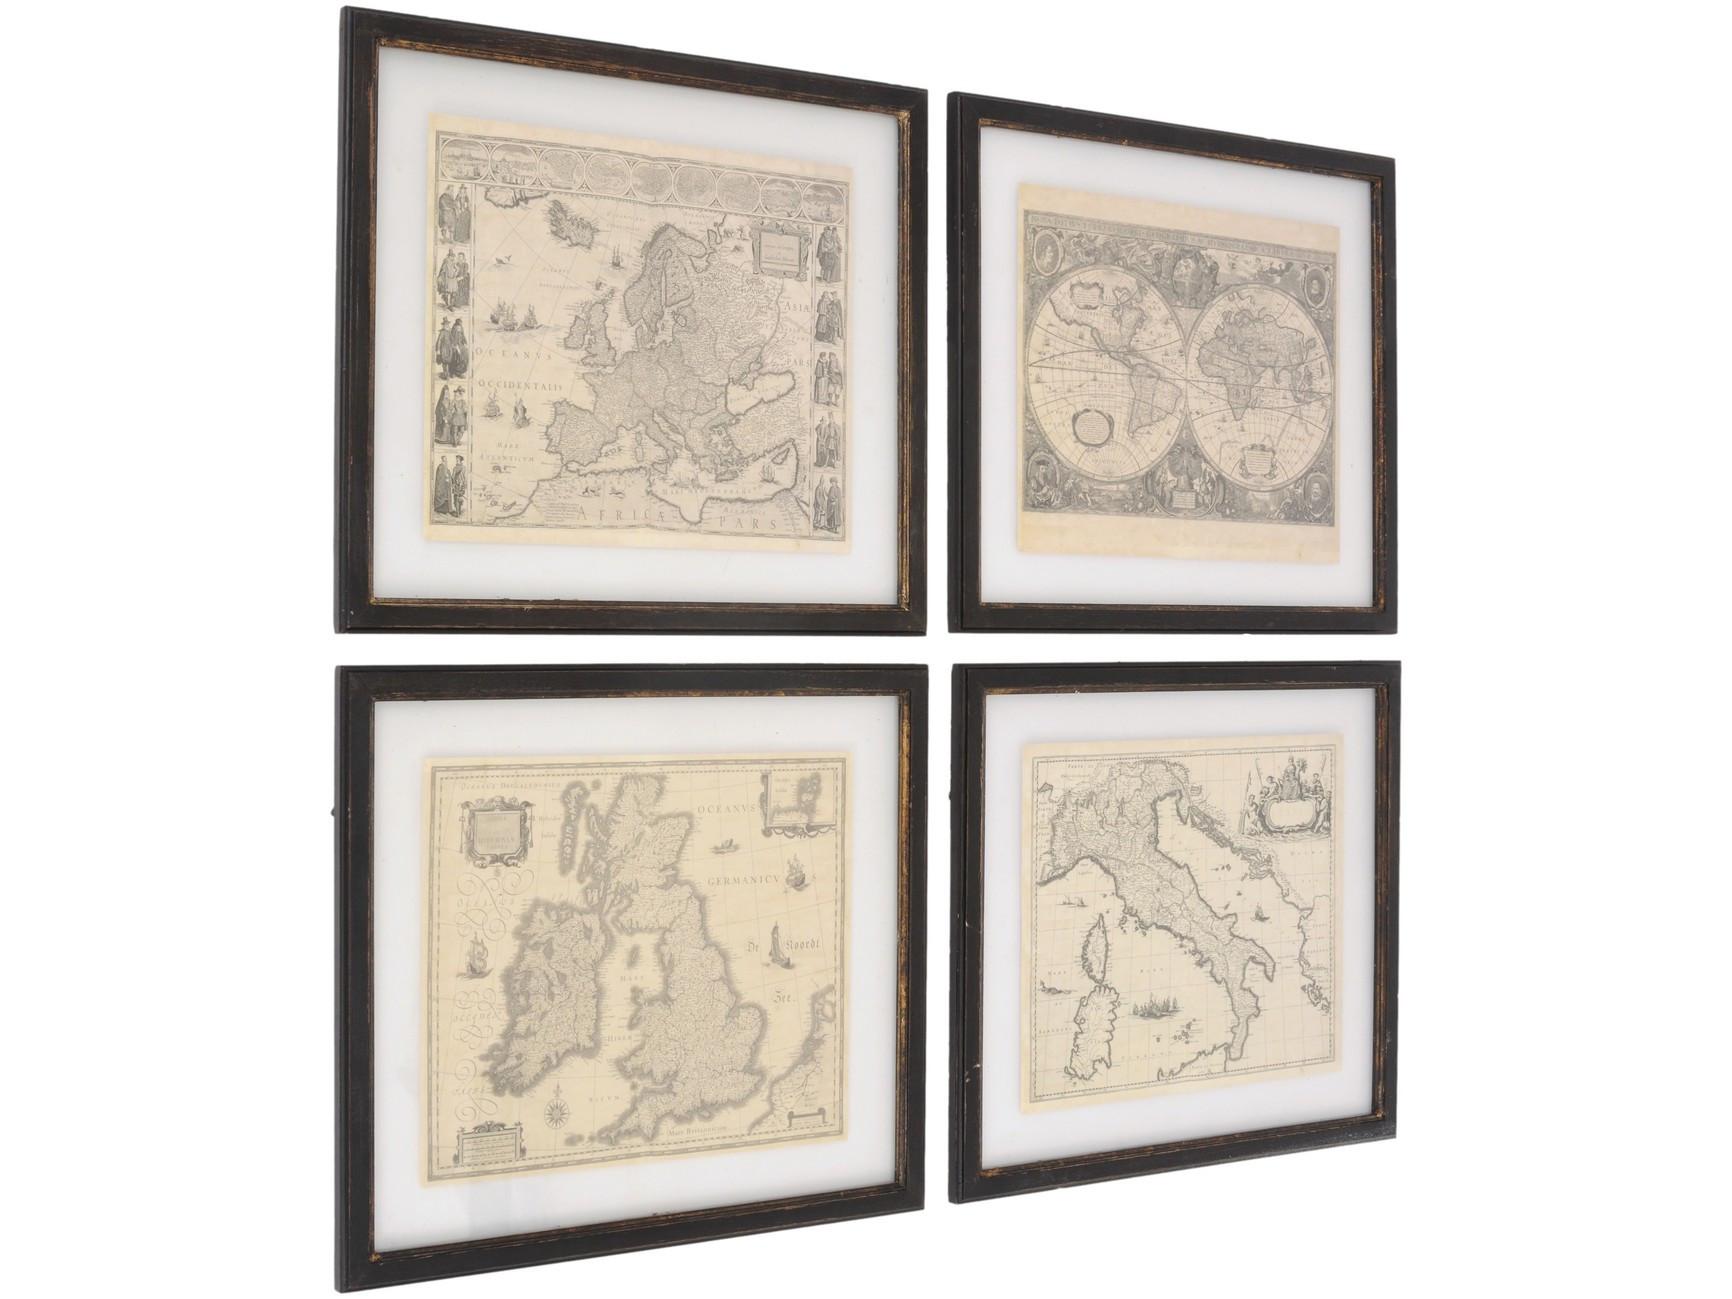 ea045ac8895 Club Set Of 4 Framed Map Prints - Daniel Laurence Home   Garden